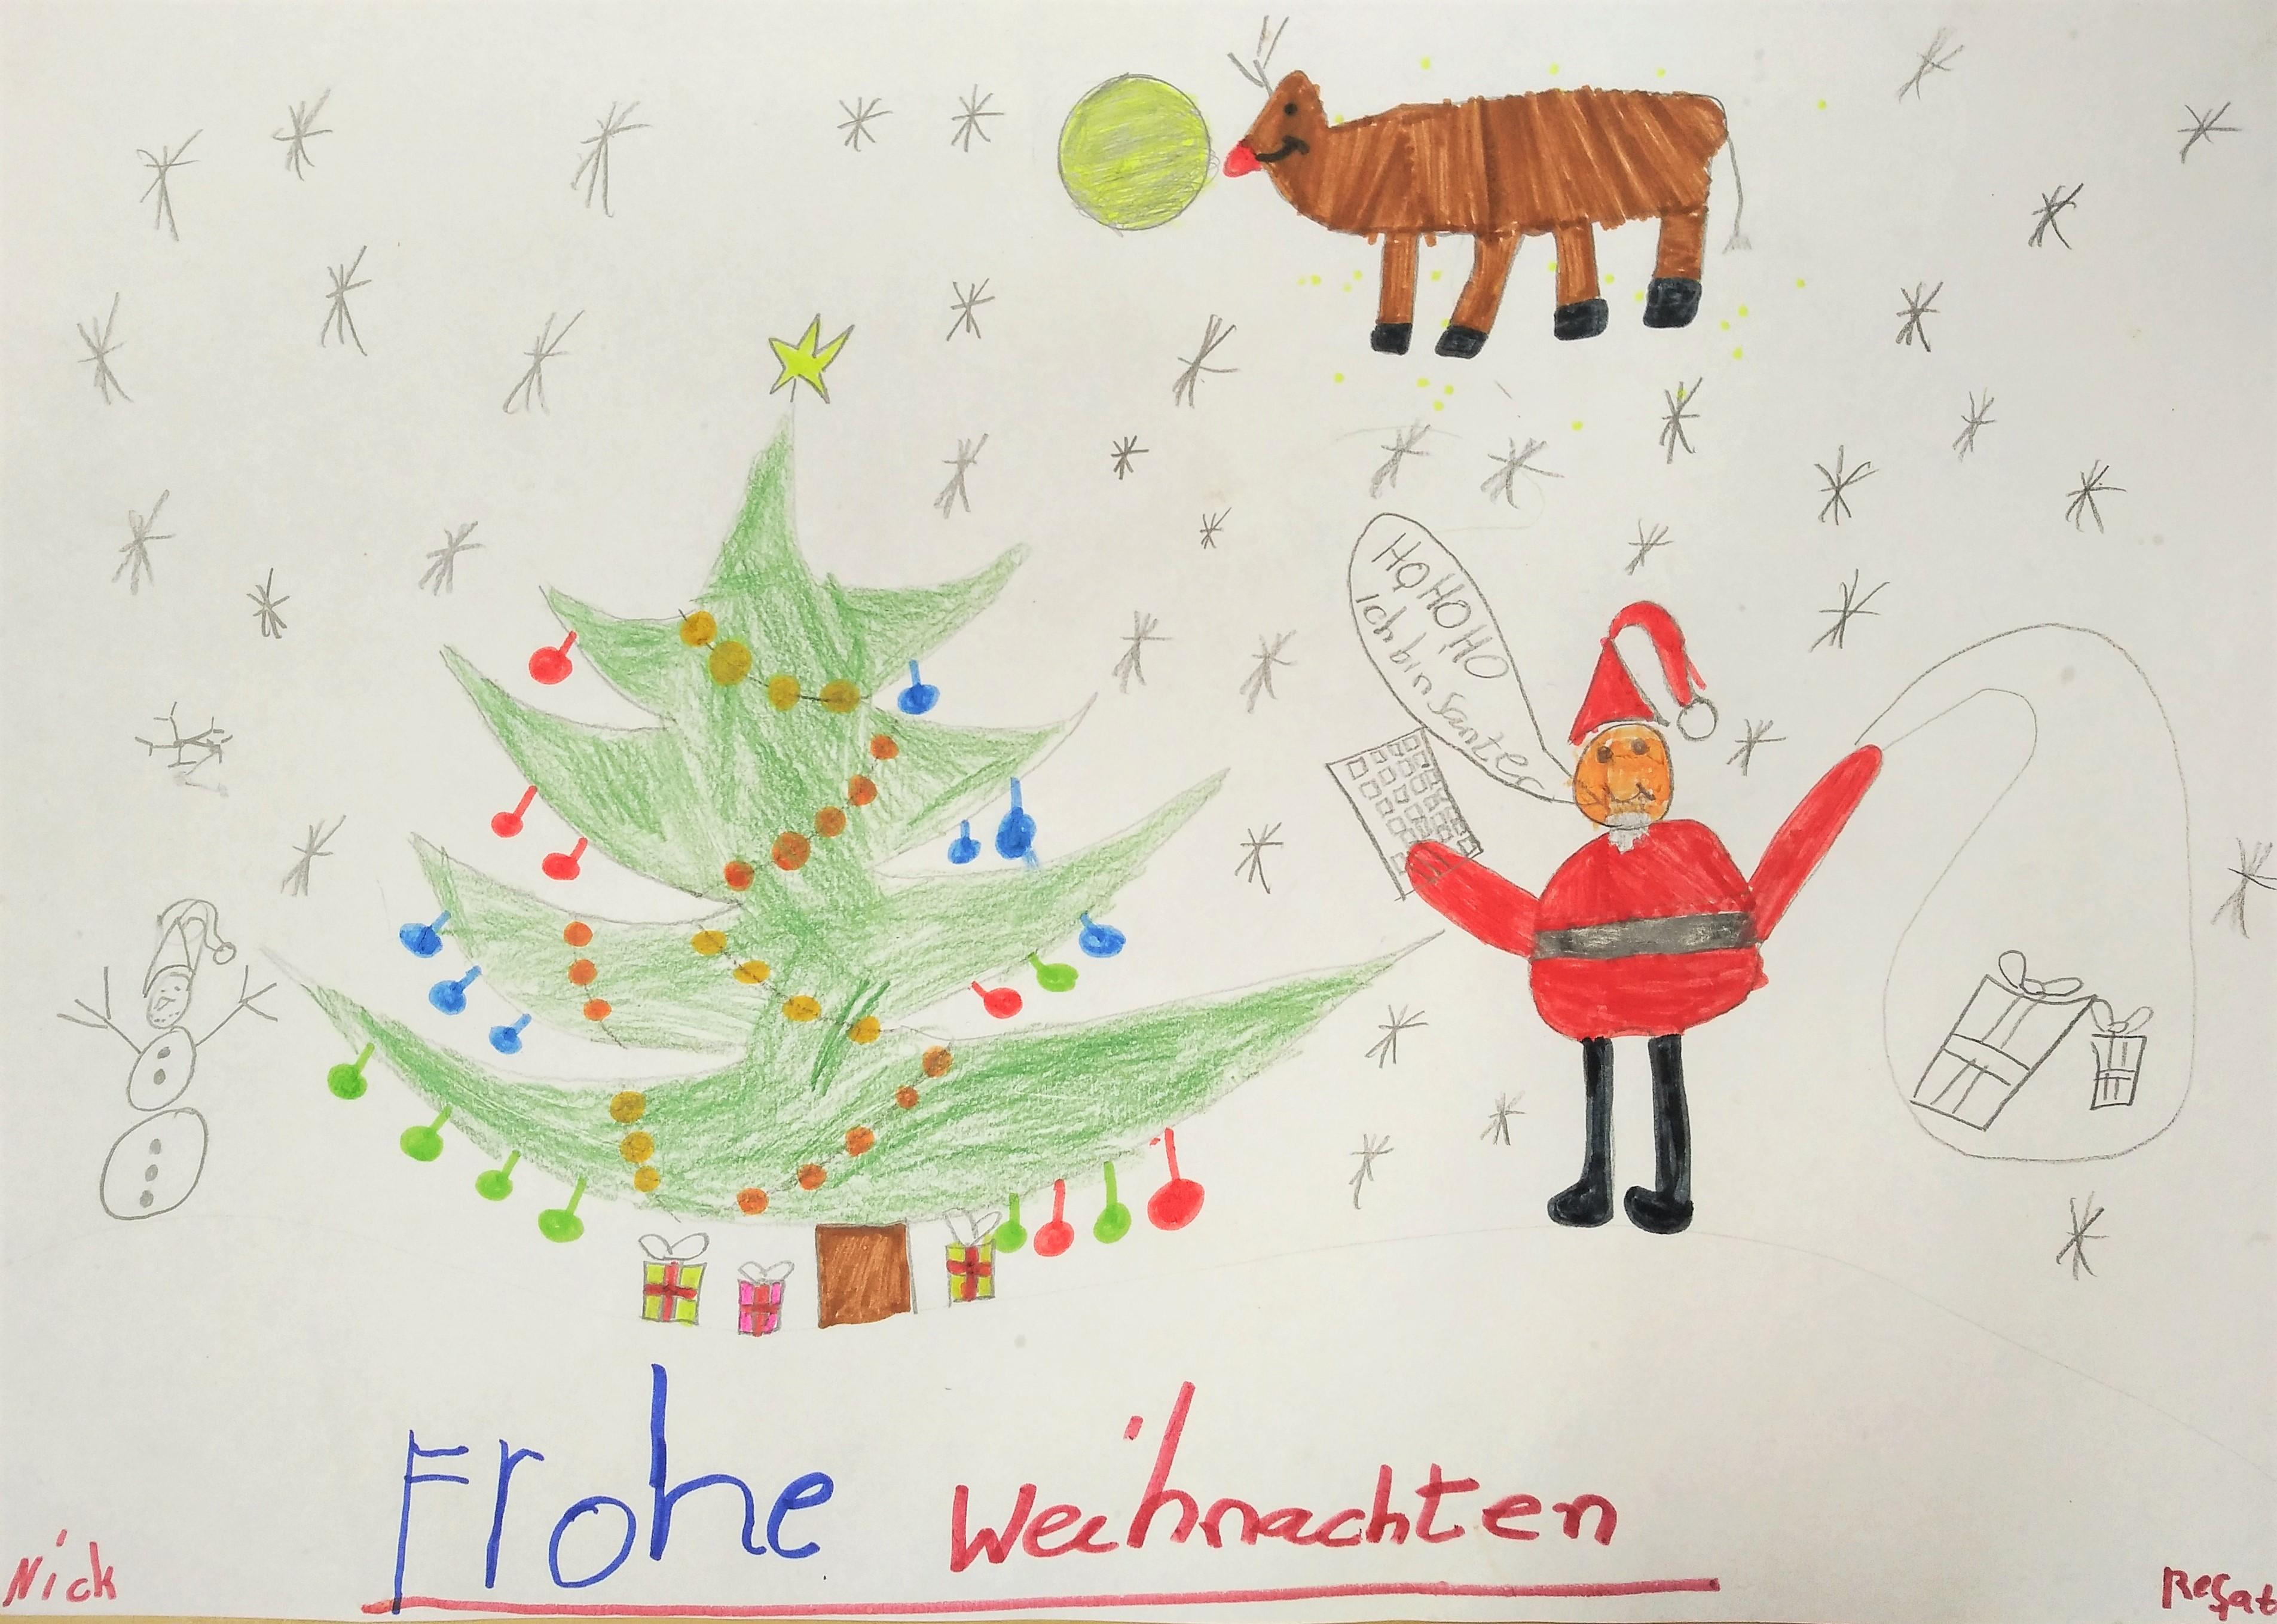 http://friedensschule.schulen-dormagen.de/wp-content/uploads/2018/12/IMG_20181220_102728-01.jpeg